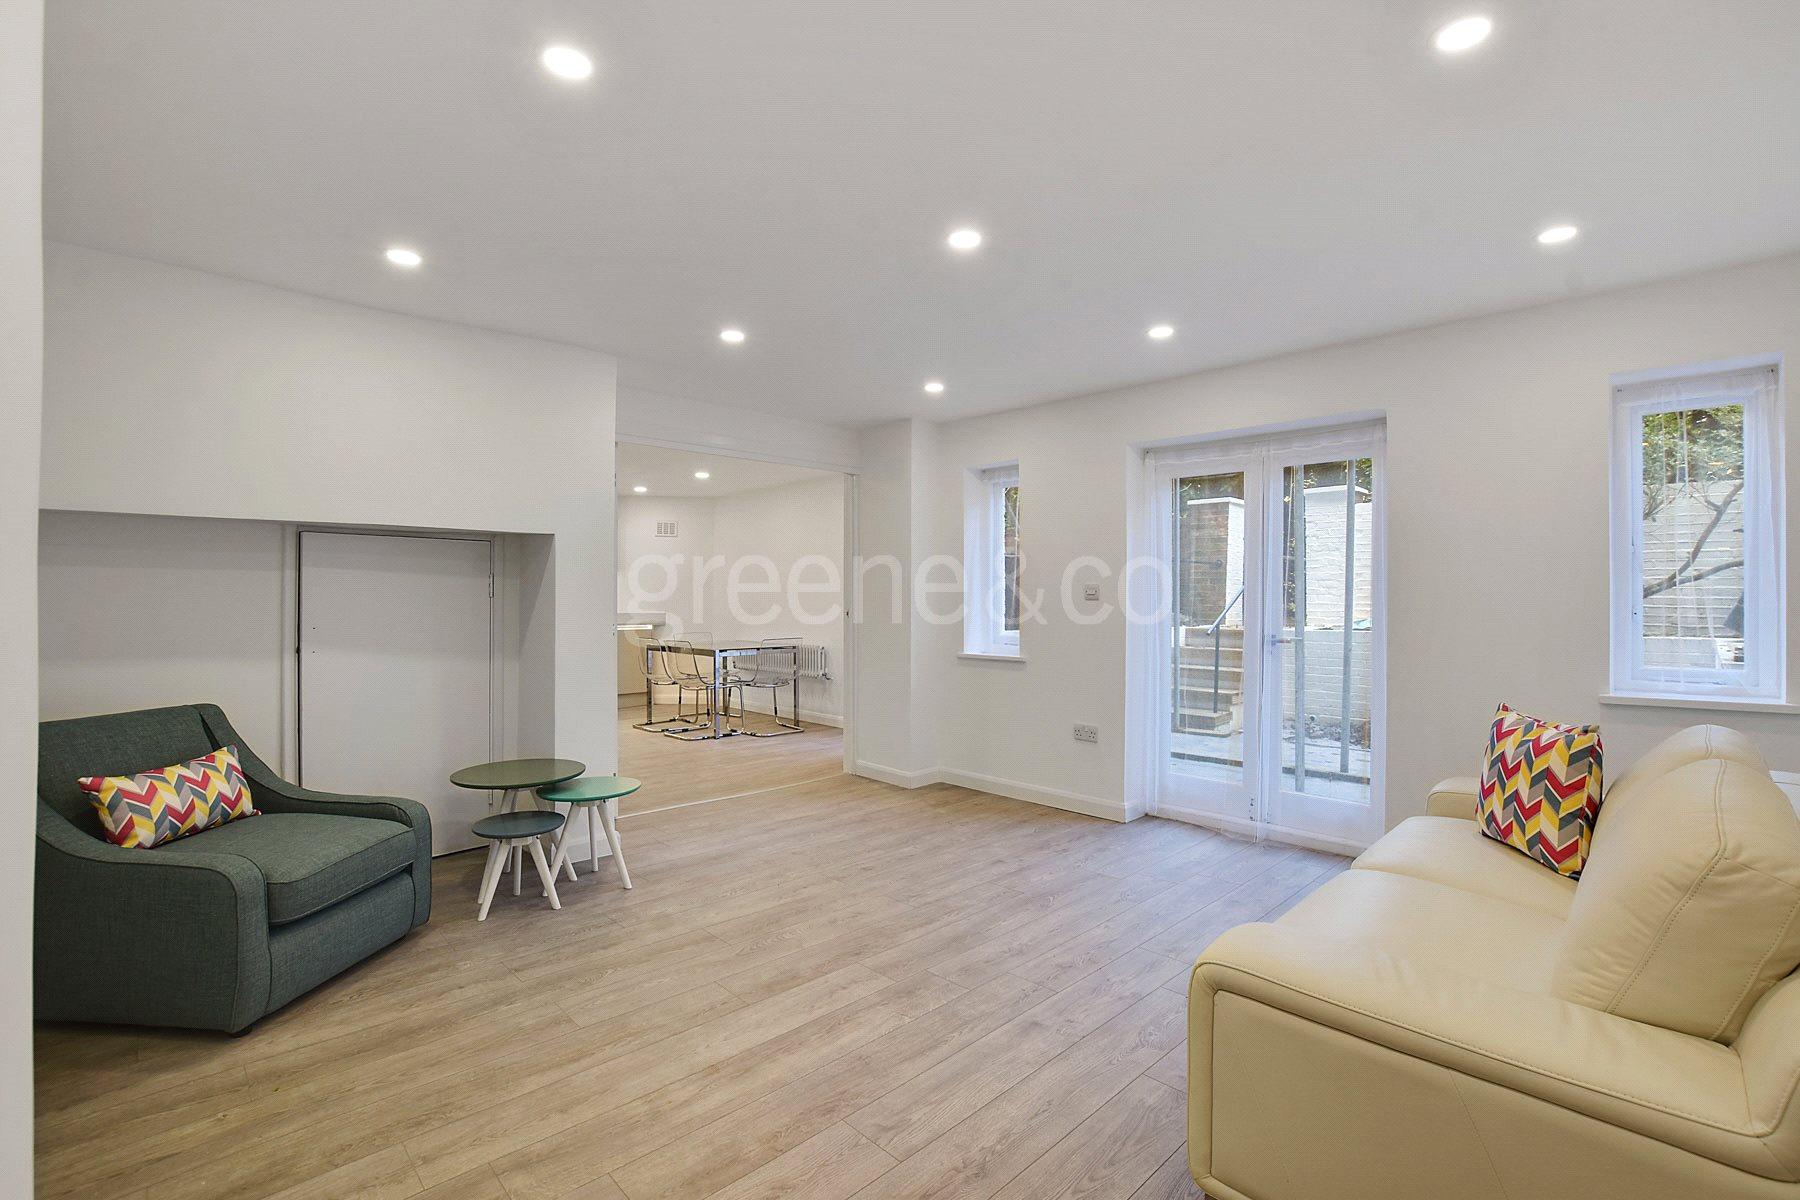 3 Bedrooms Flat for sale in Fairhazel Gardens, South Hampstead, London, NW6